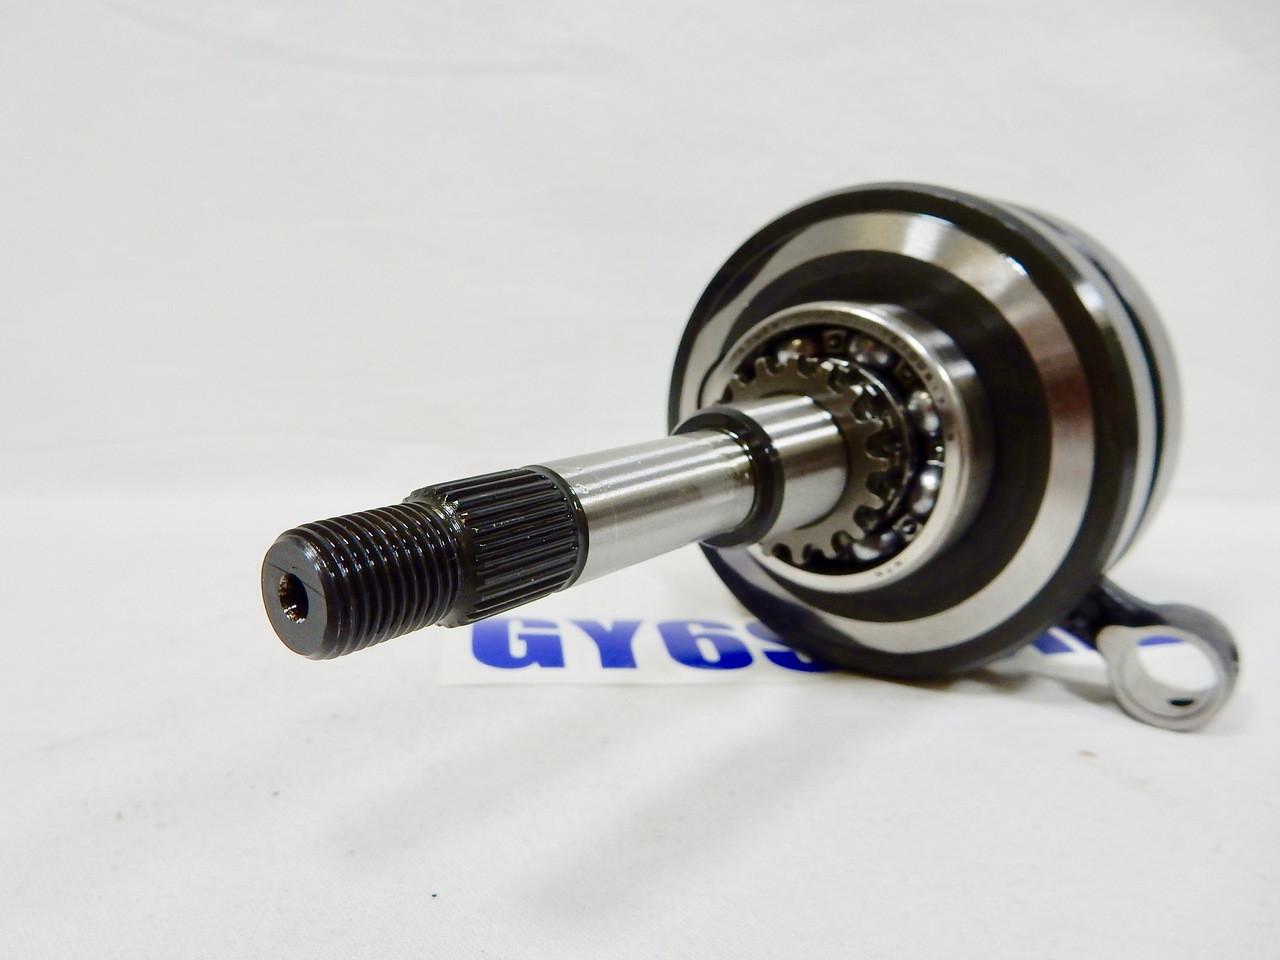 SSP-G 44mm STROKER CRANKSHAFT ASSEMBLY FOR 50cc 4-STROKE QMB139 ENGINES